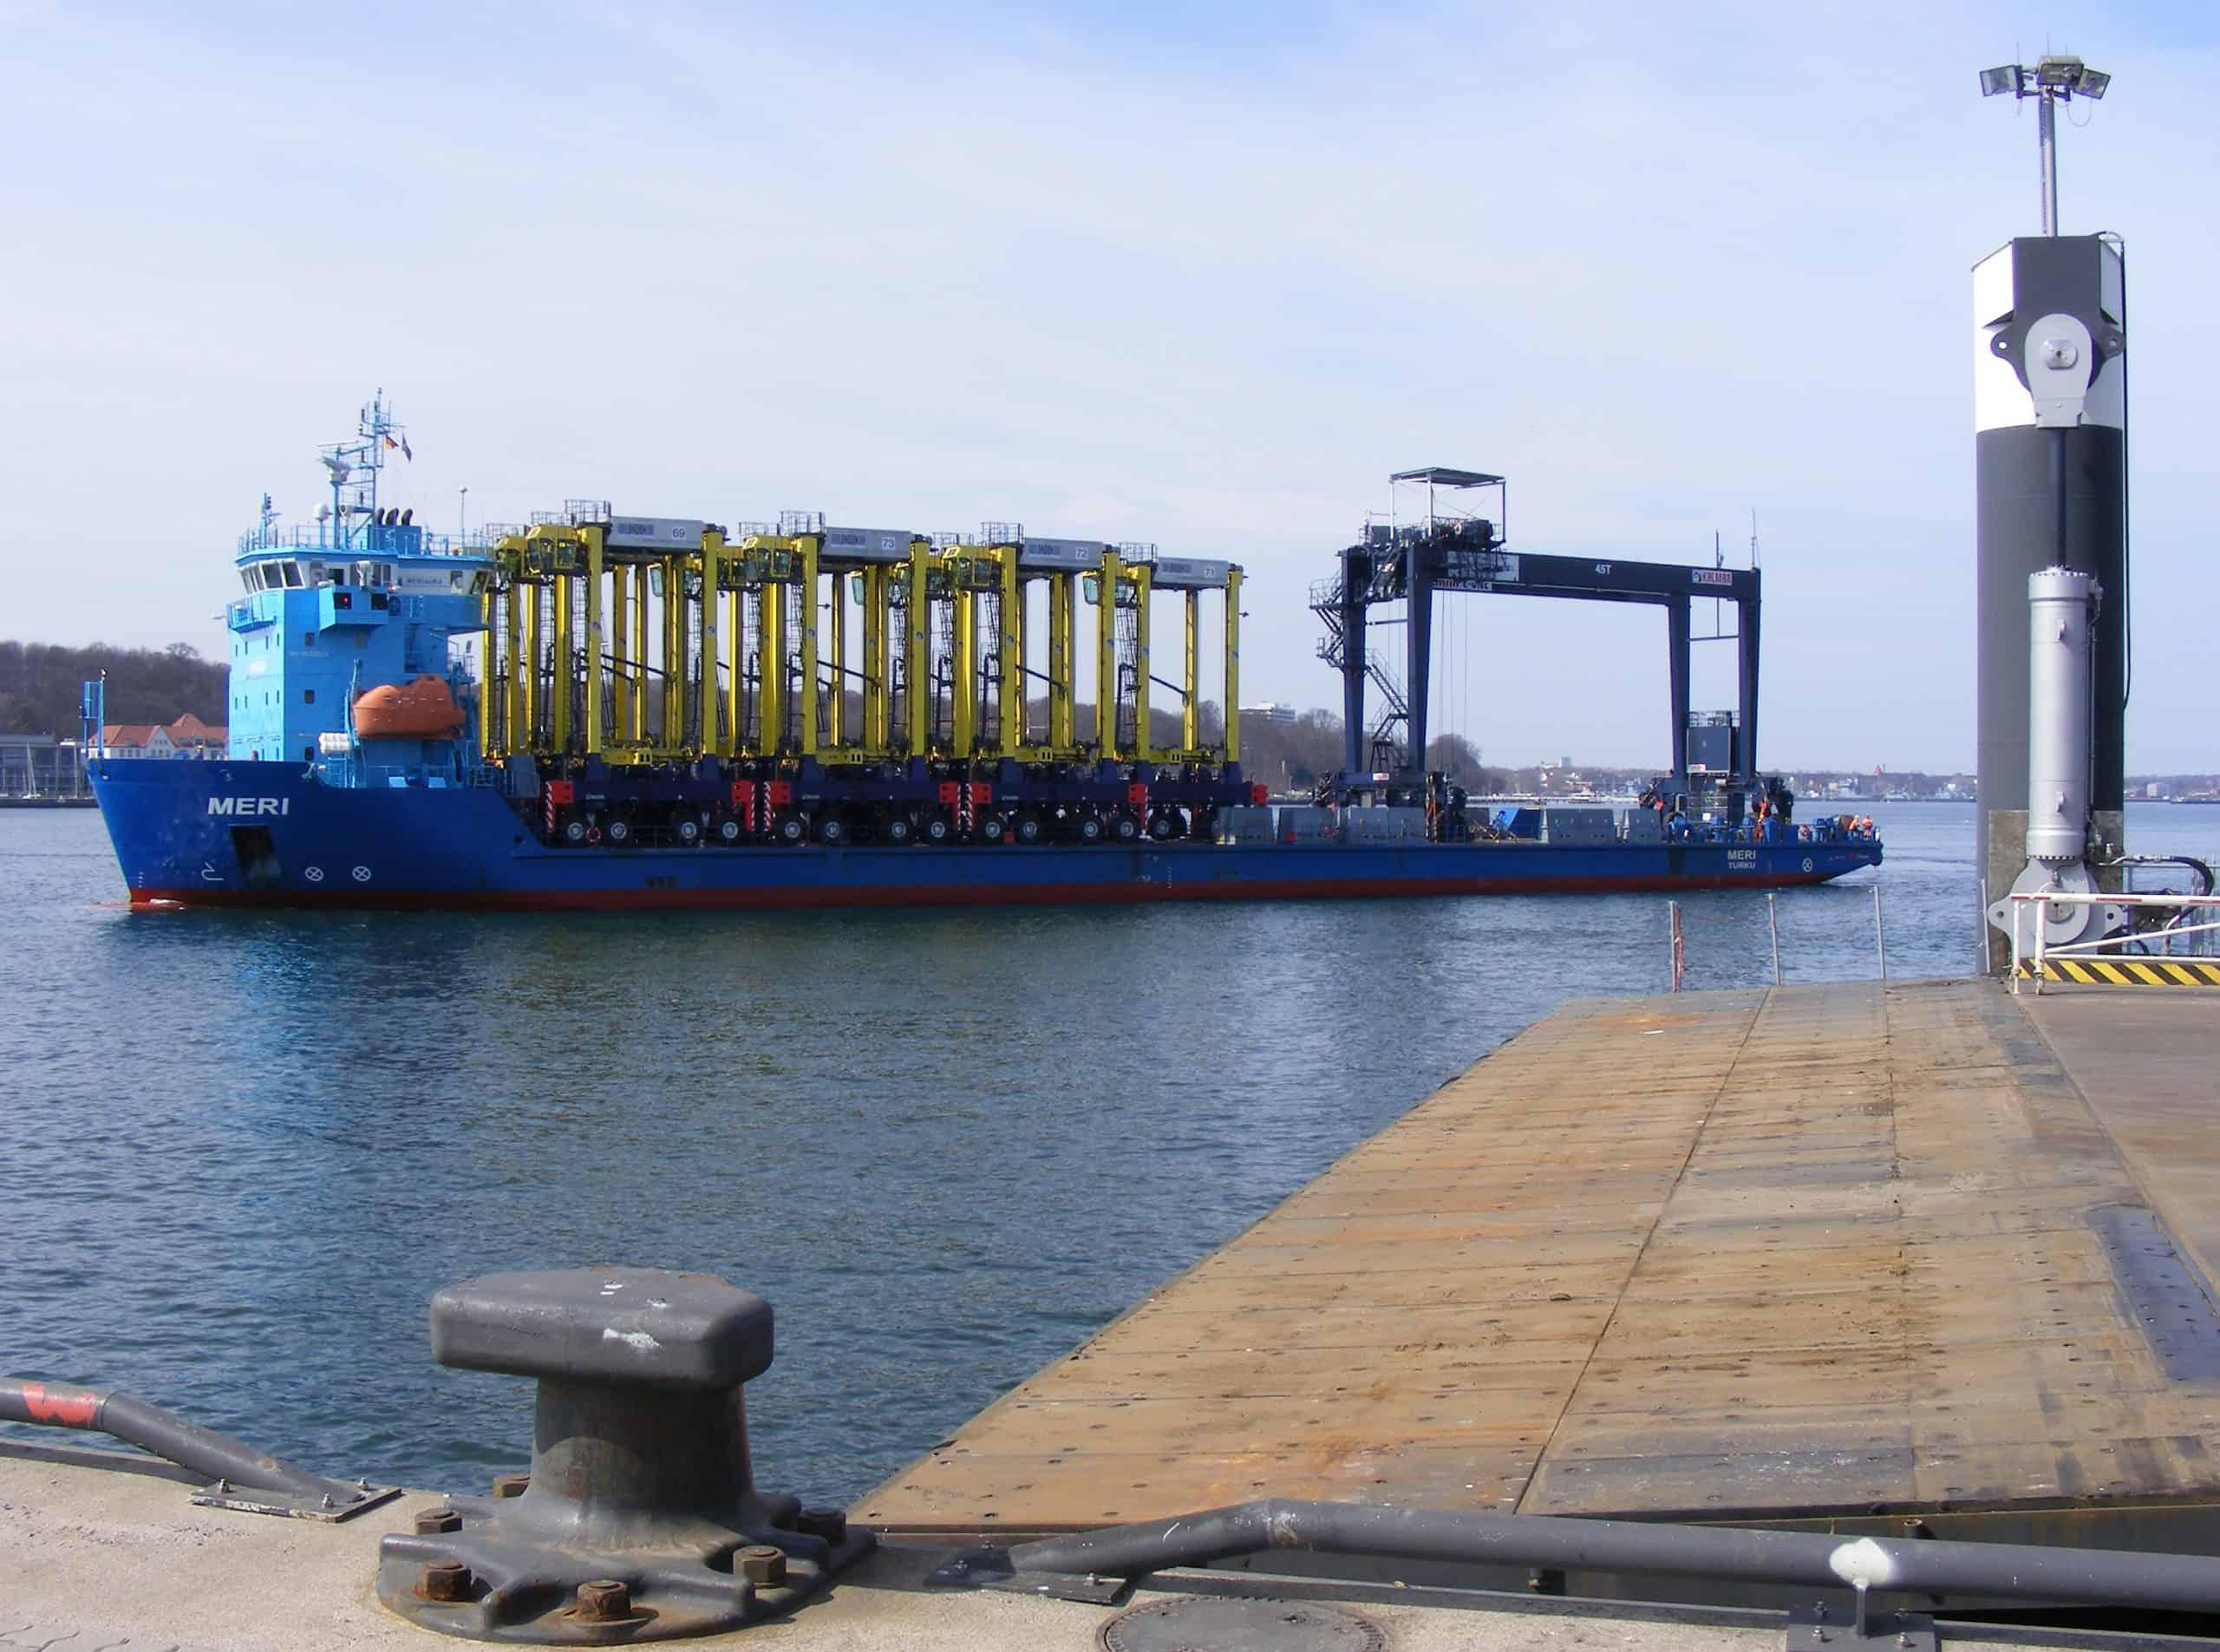 Kiel's intermodal RTG arrives